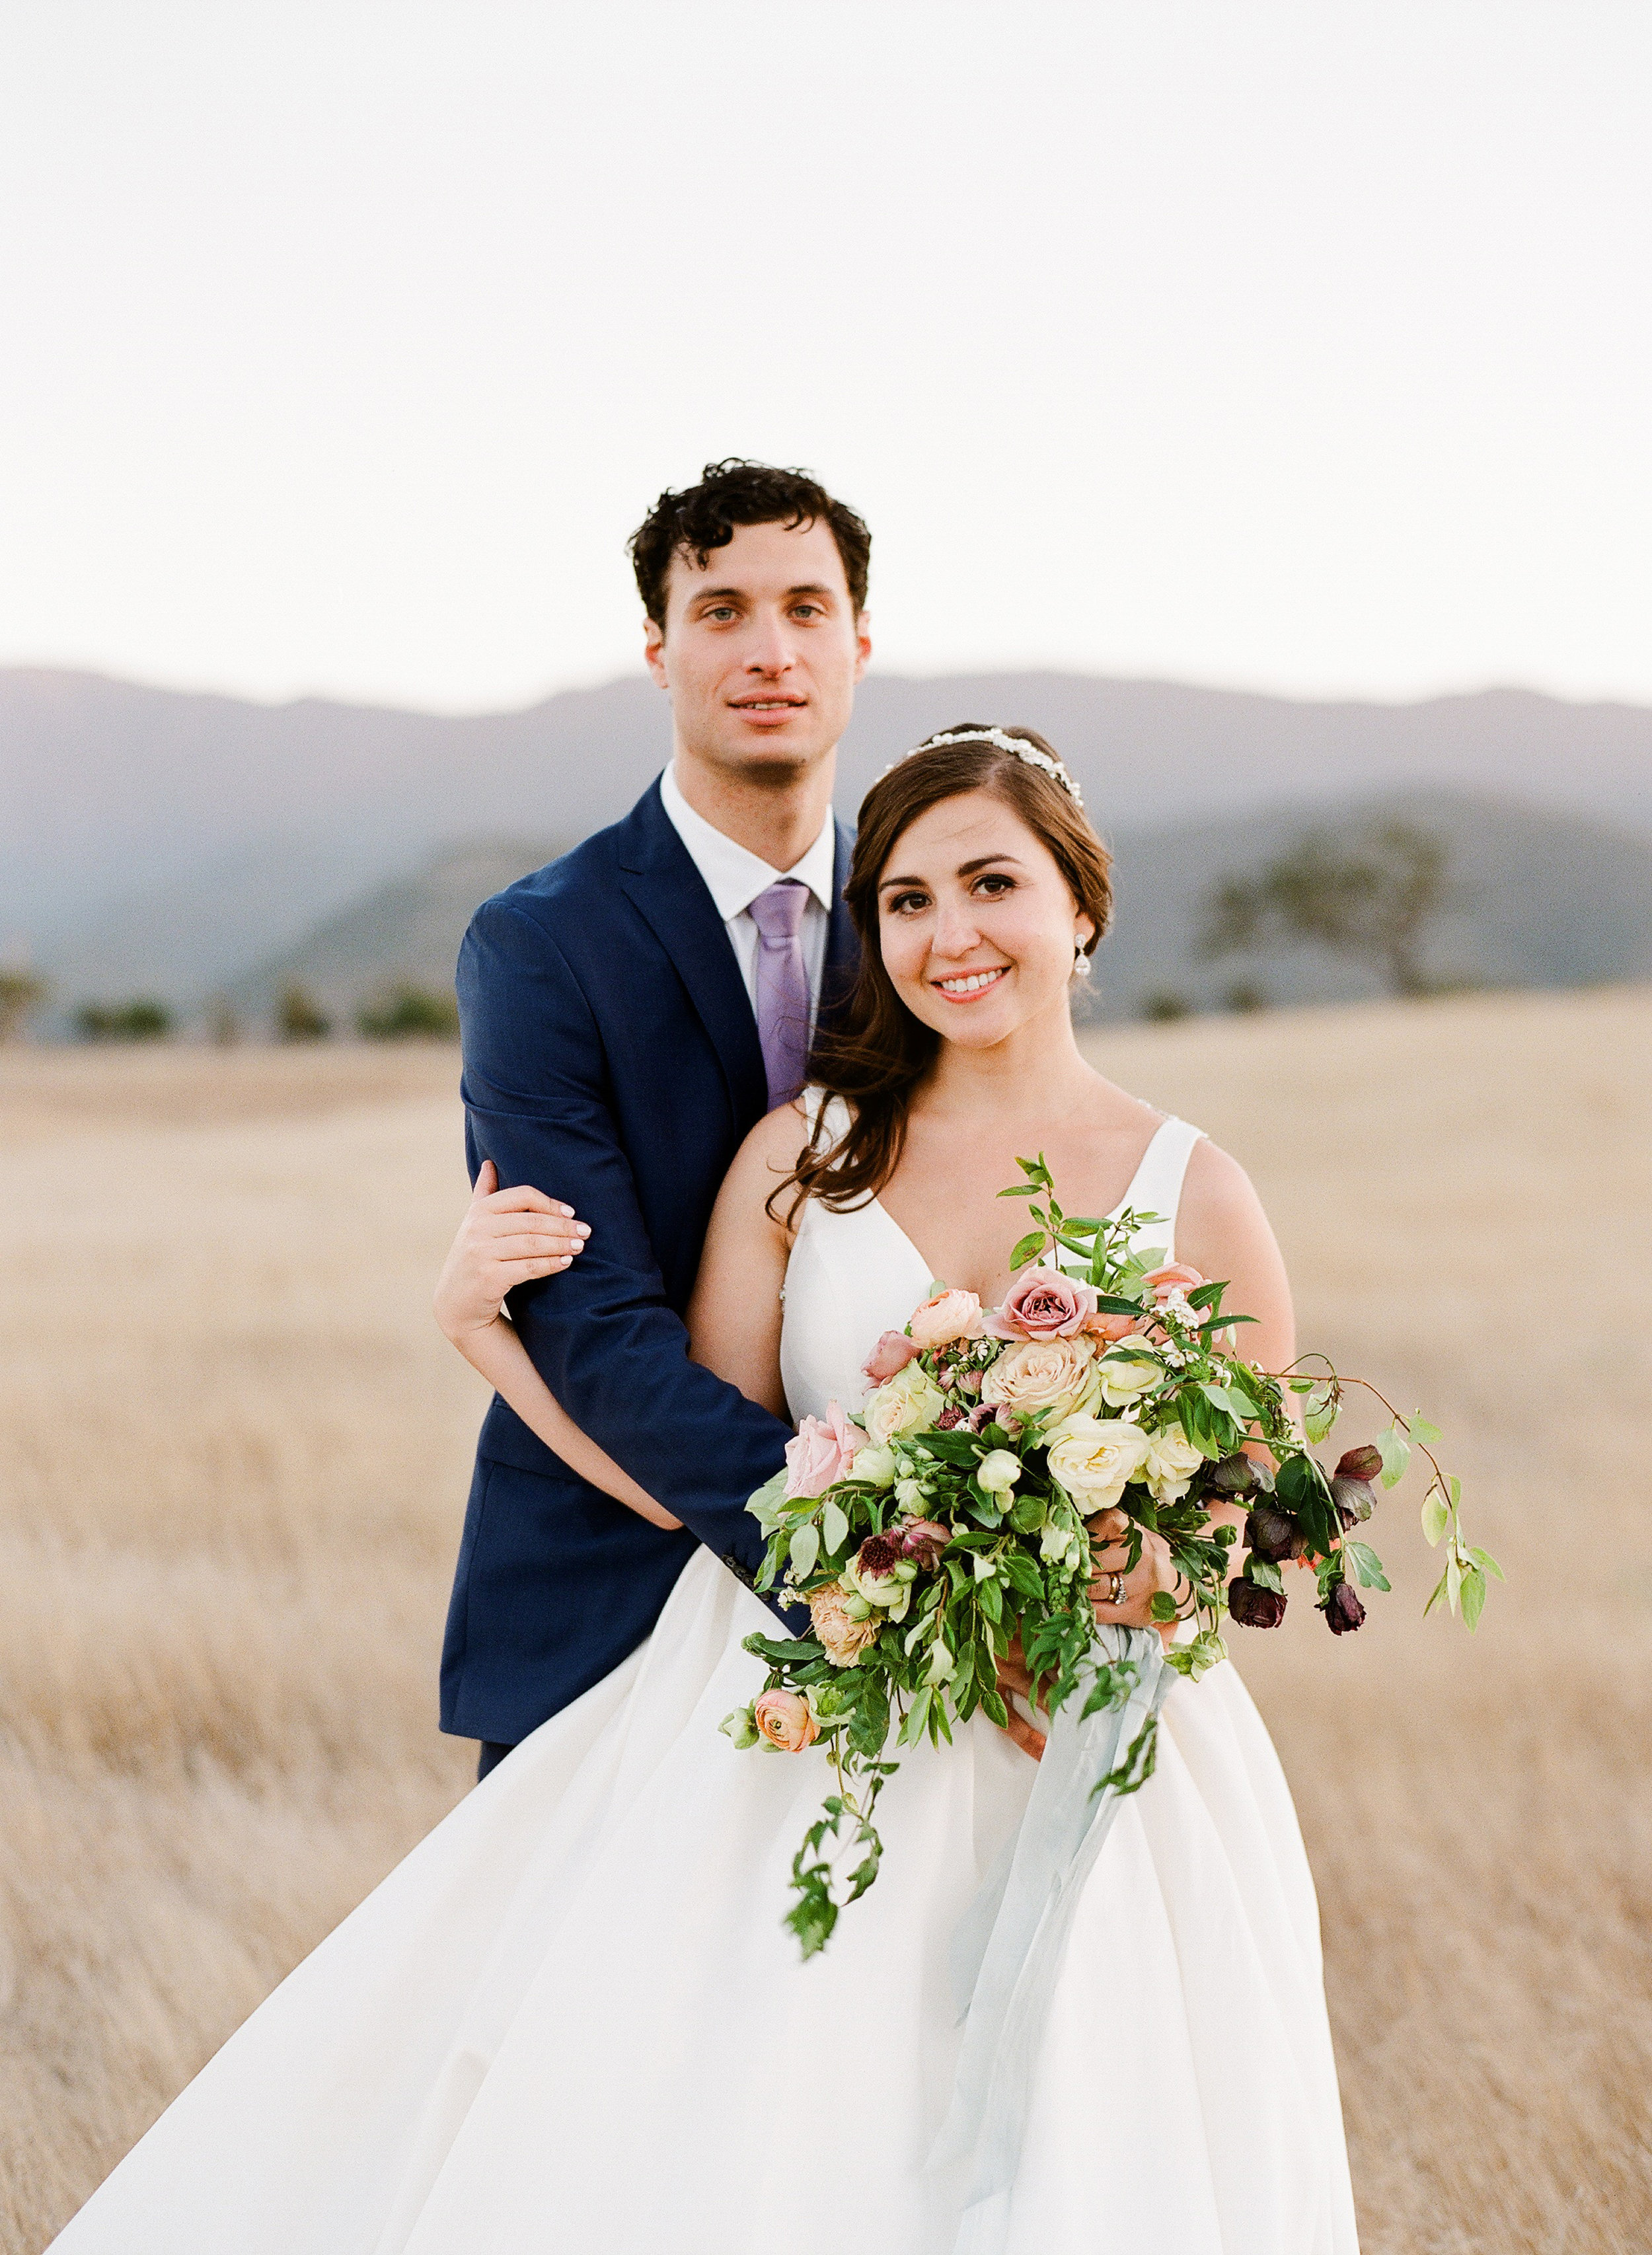 santa-barbara-elopement-elope-wedding-planner-planning-coordinator-day-of-intimate-event-design-kestrel-park-santa-ynez-english-country-estate-garden-castle (18).jpg